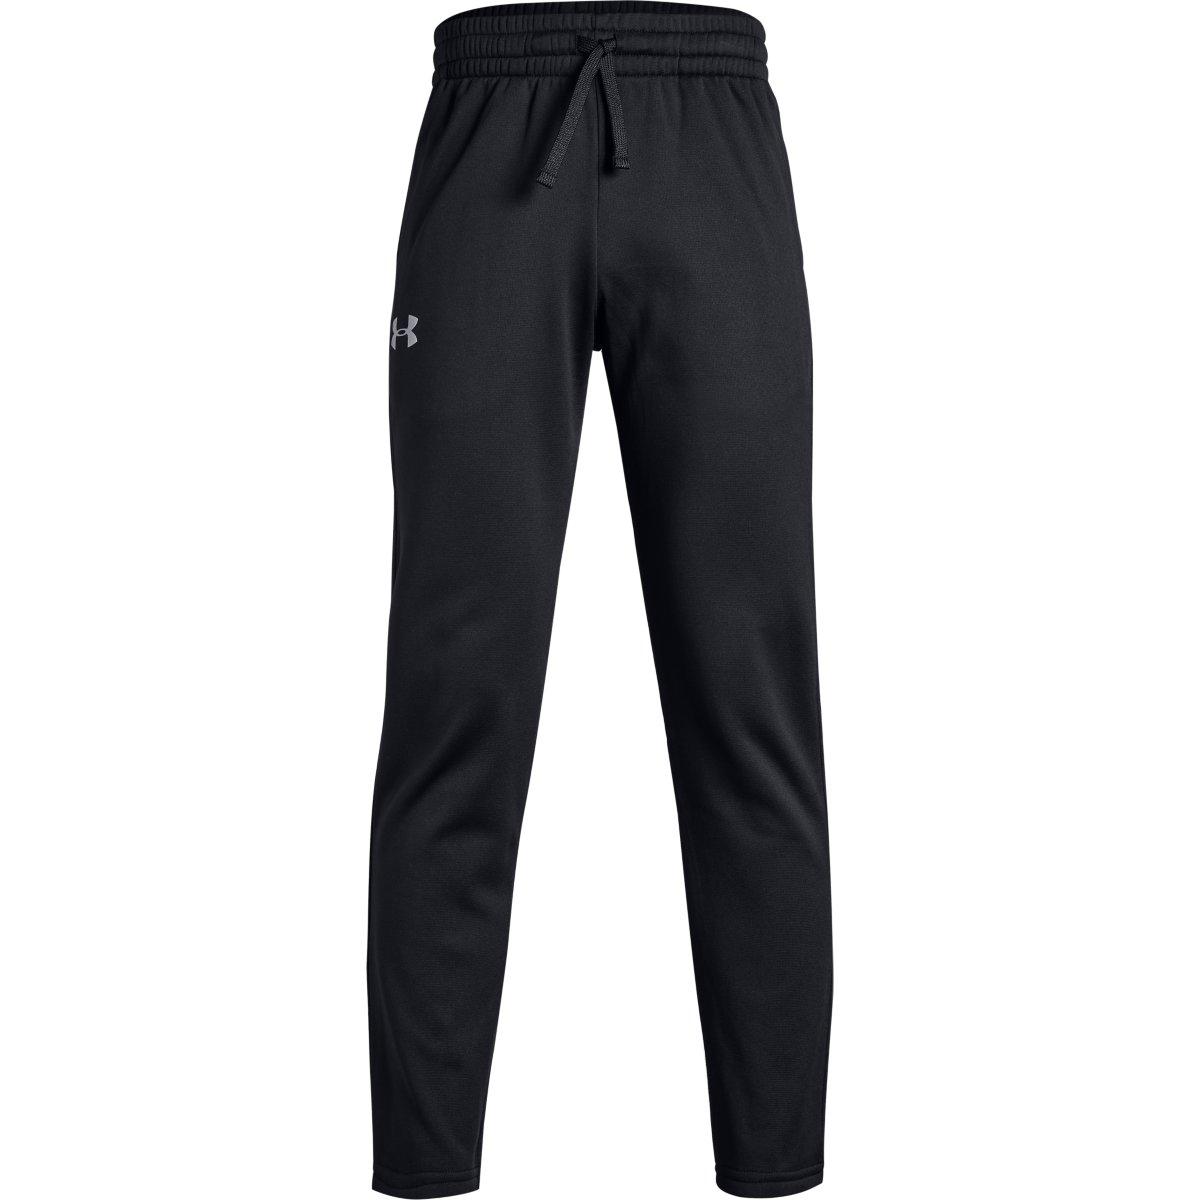 Under Armour Big Boys' Armour Fleece Pants - Black, S